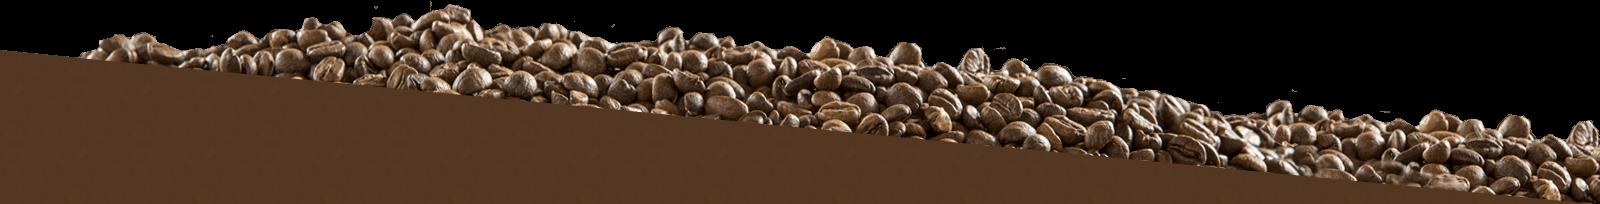 Coffeescript App Development